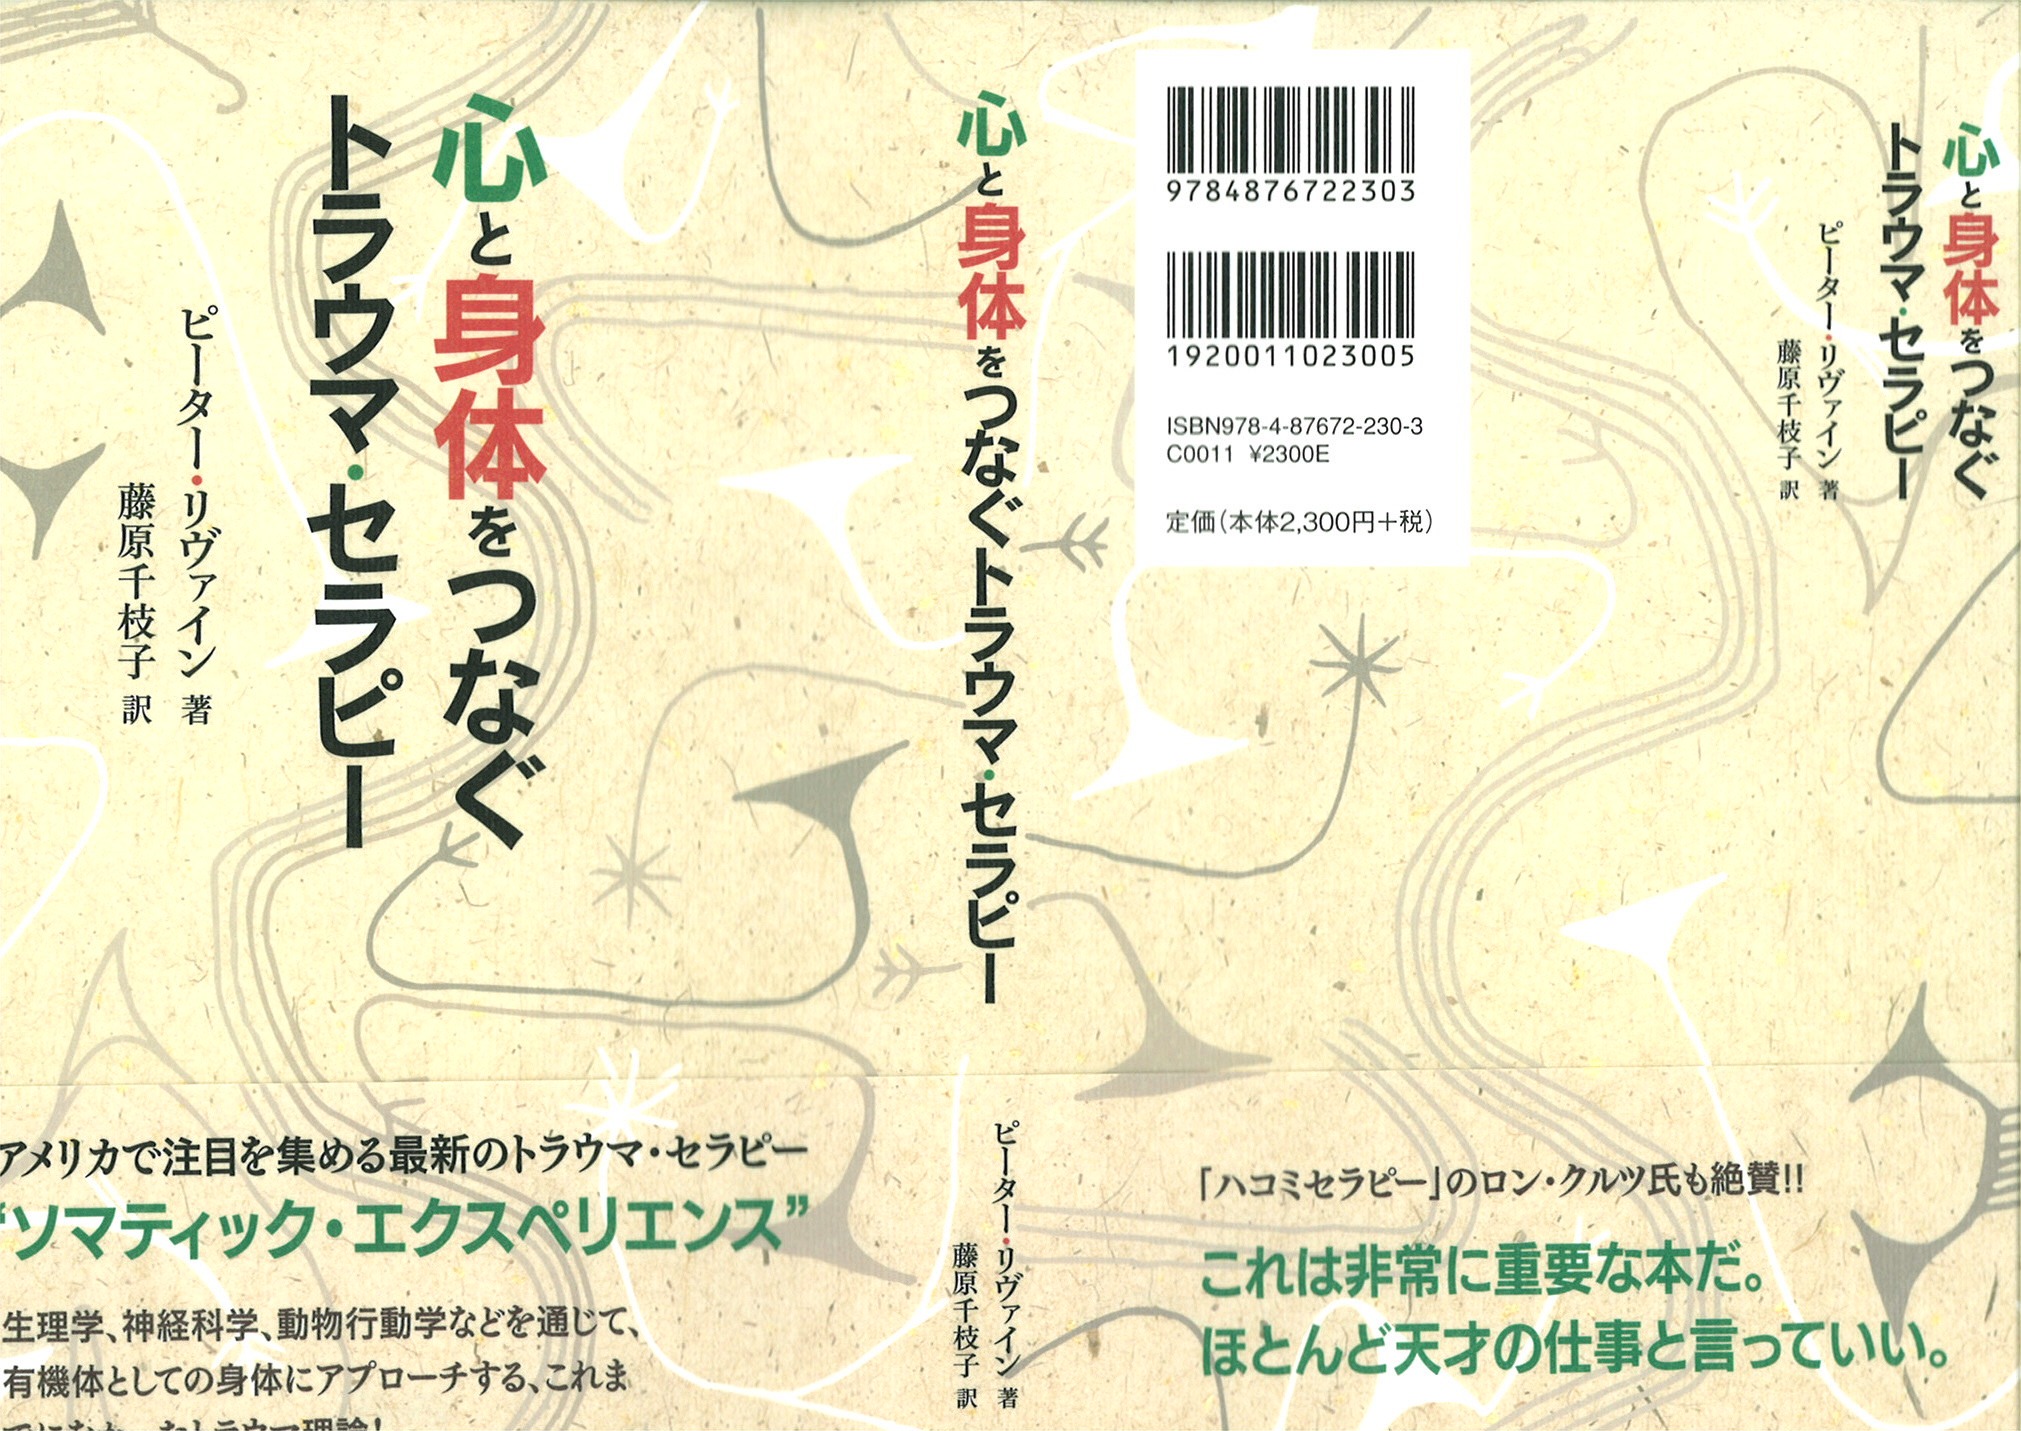 20080219175457_00001